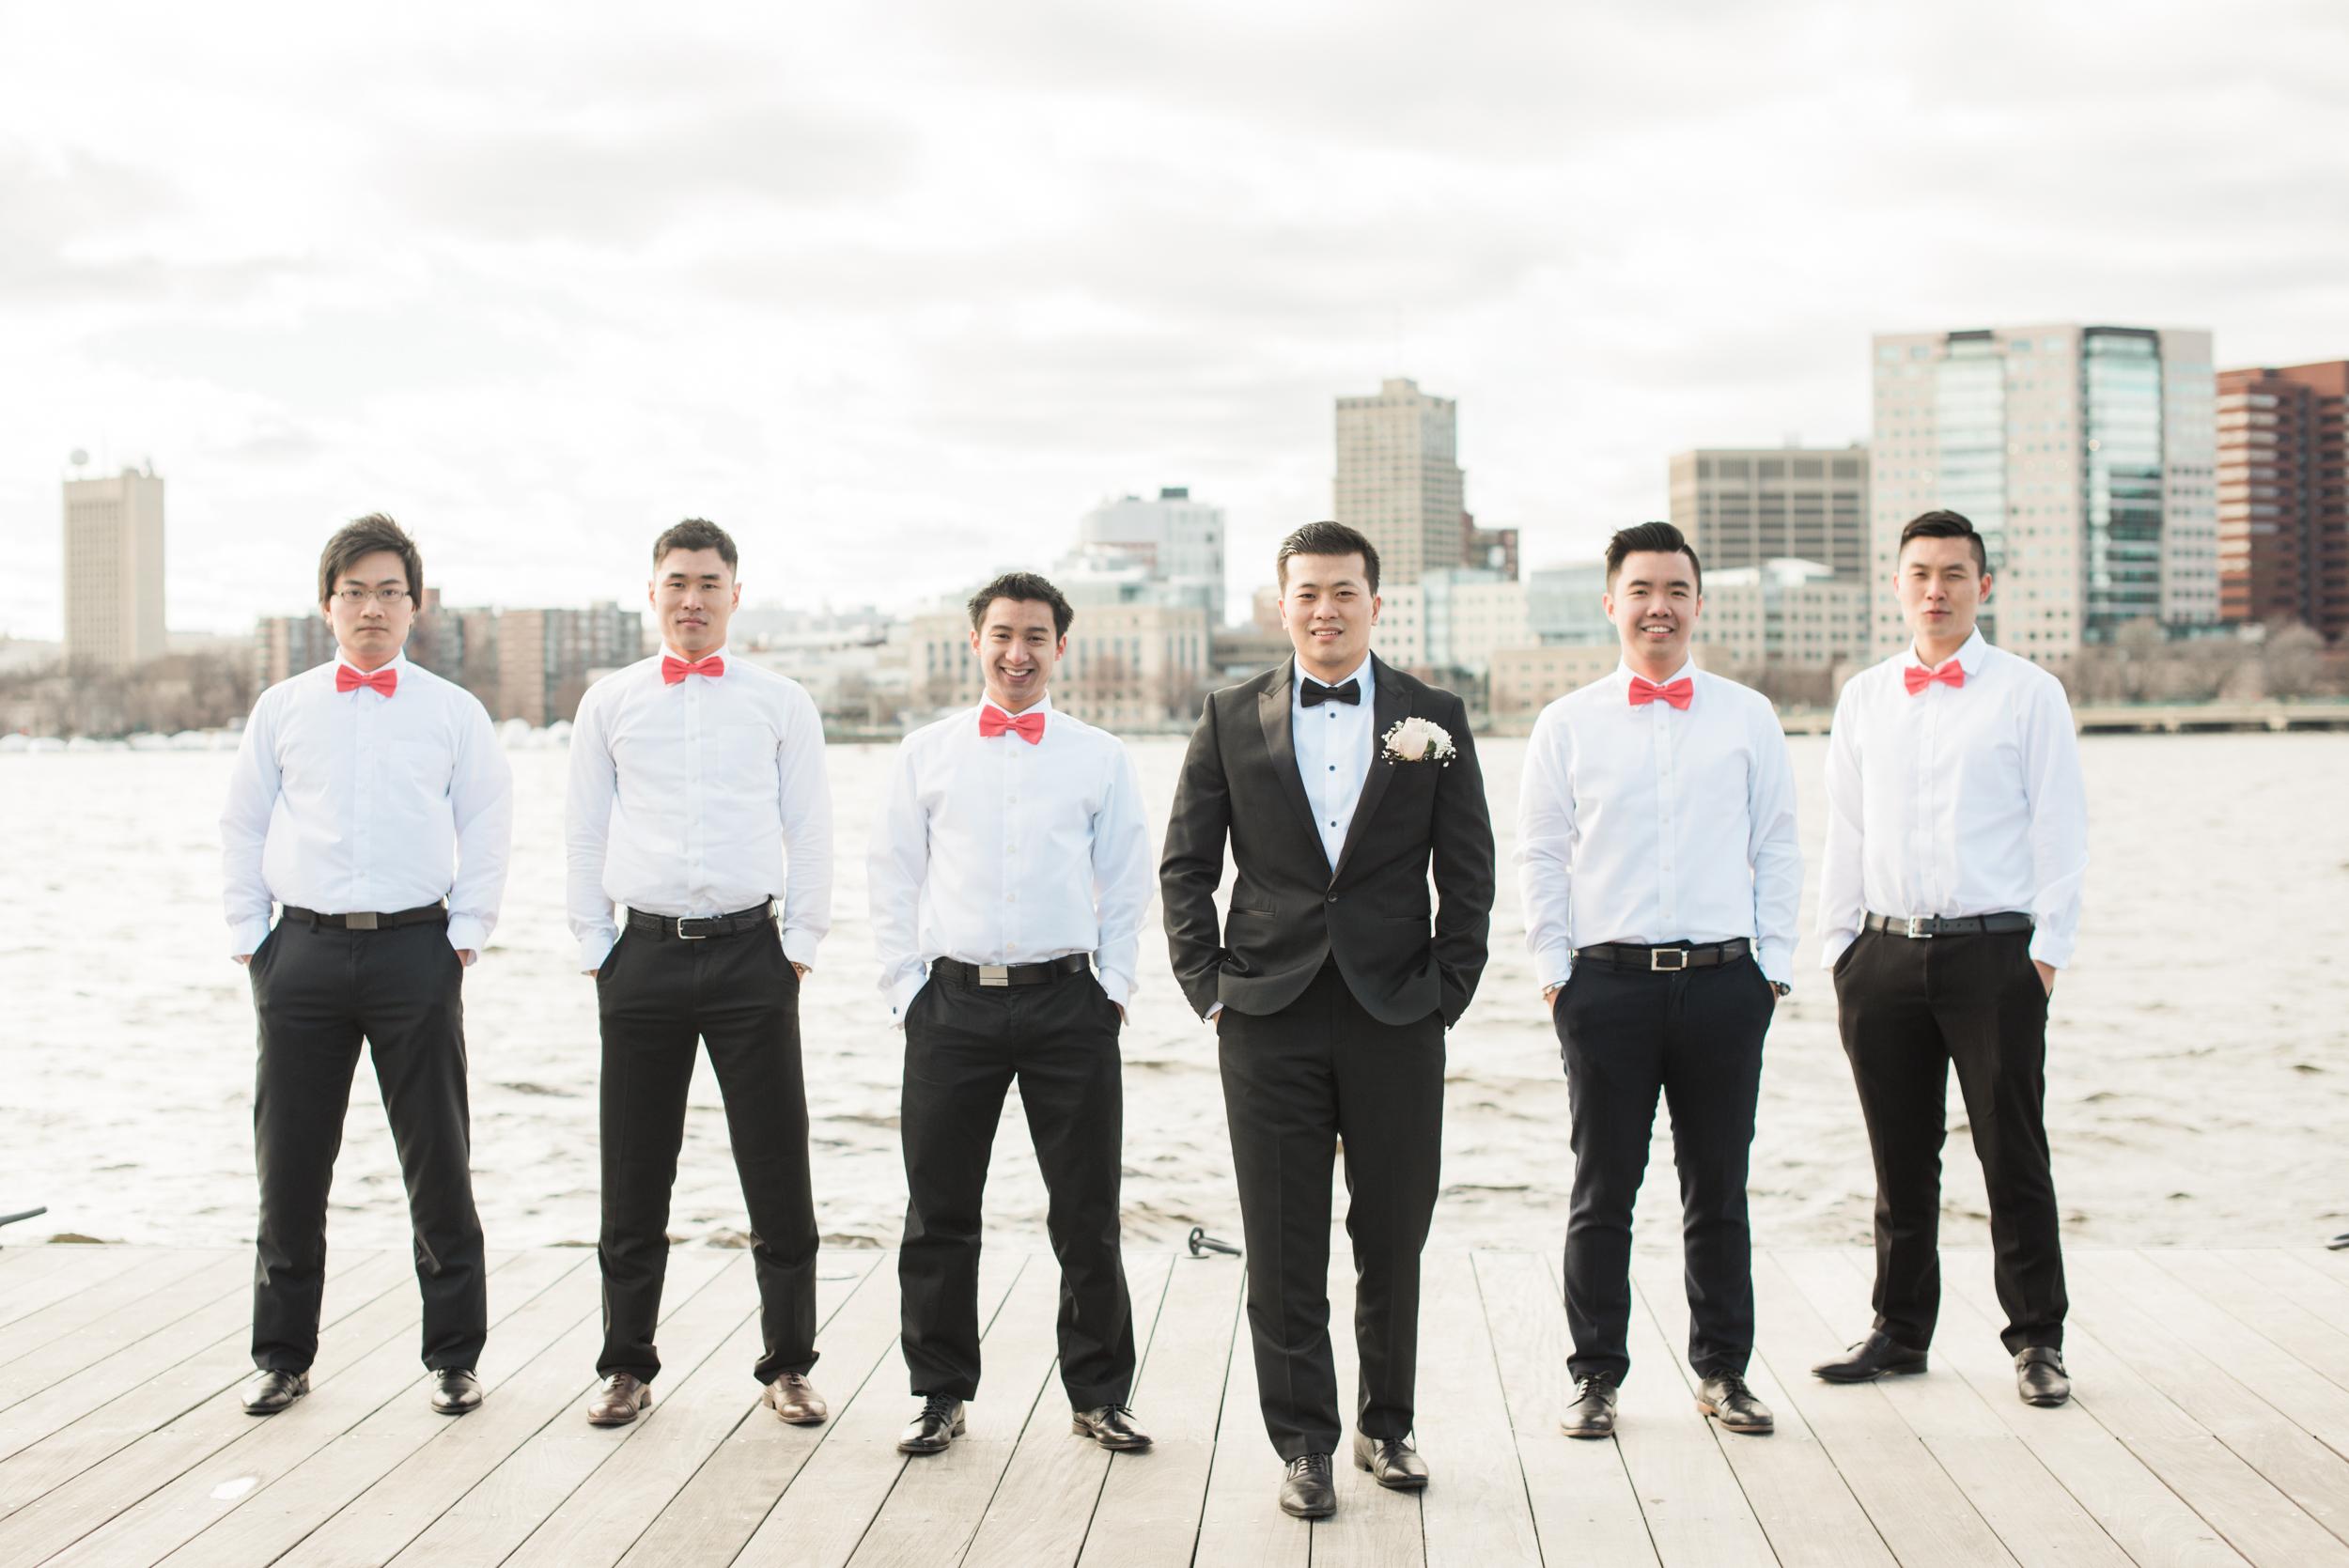 Wedding Photographers near the Berkshires